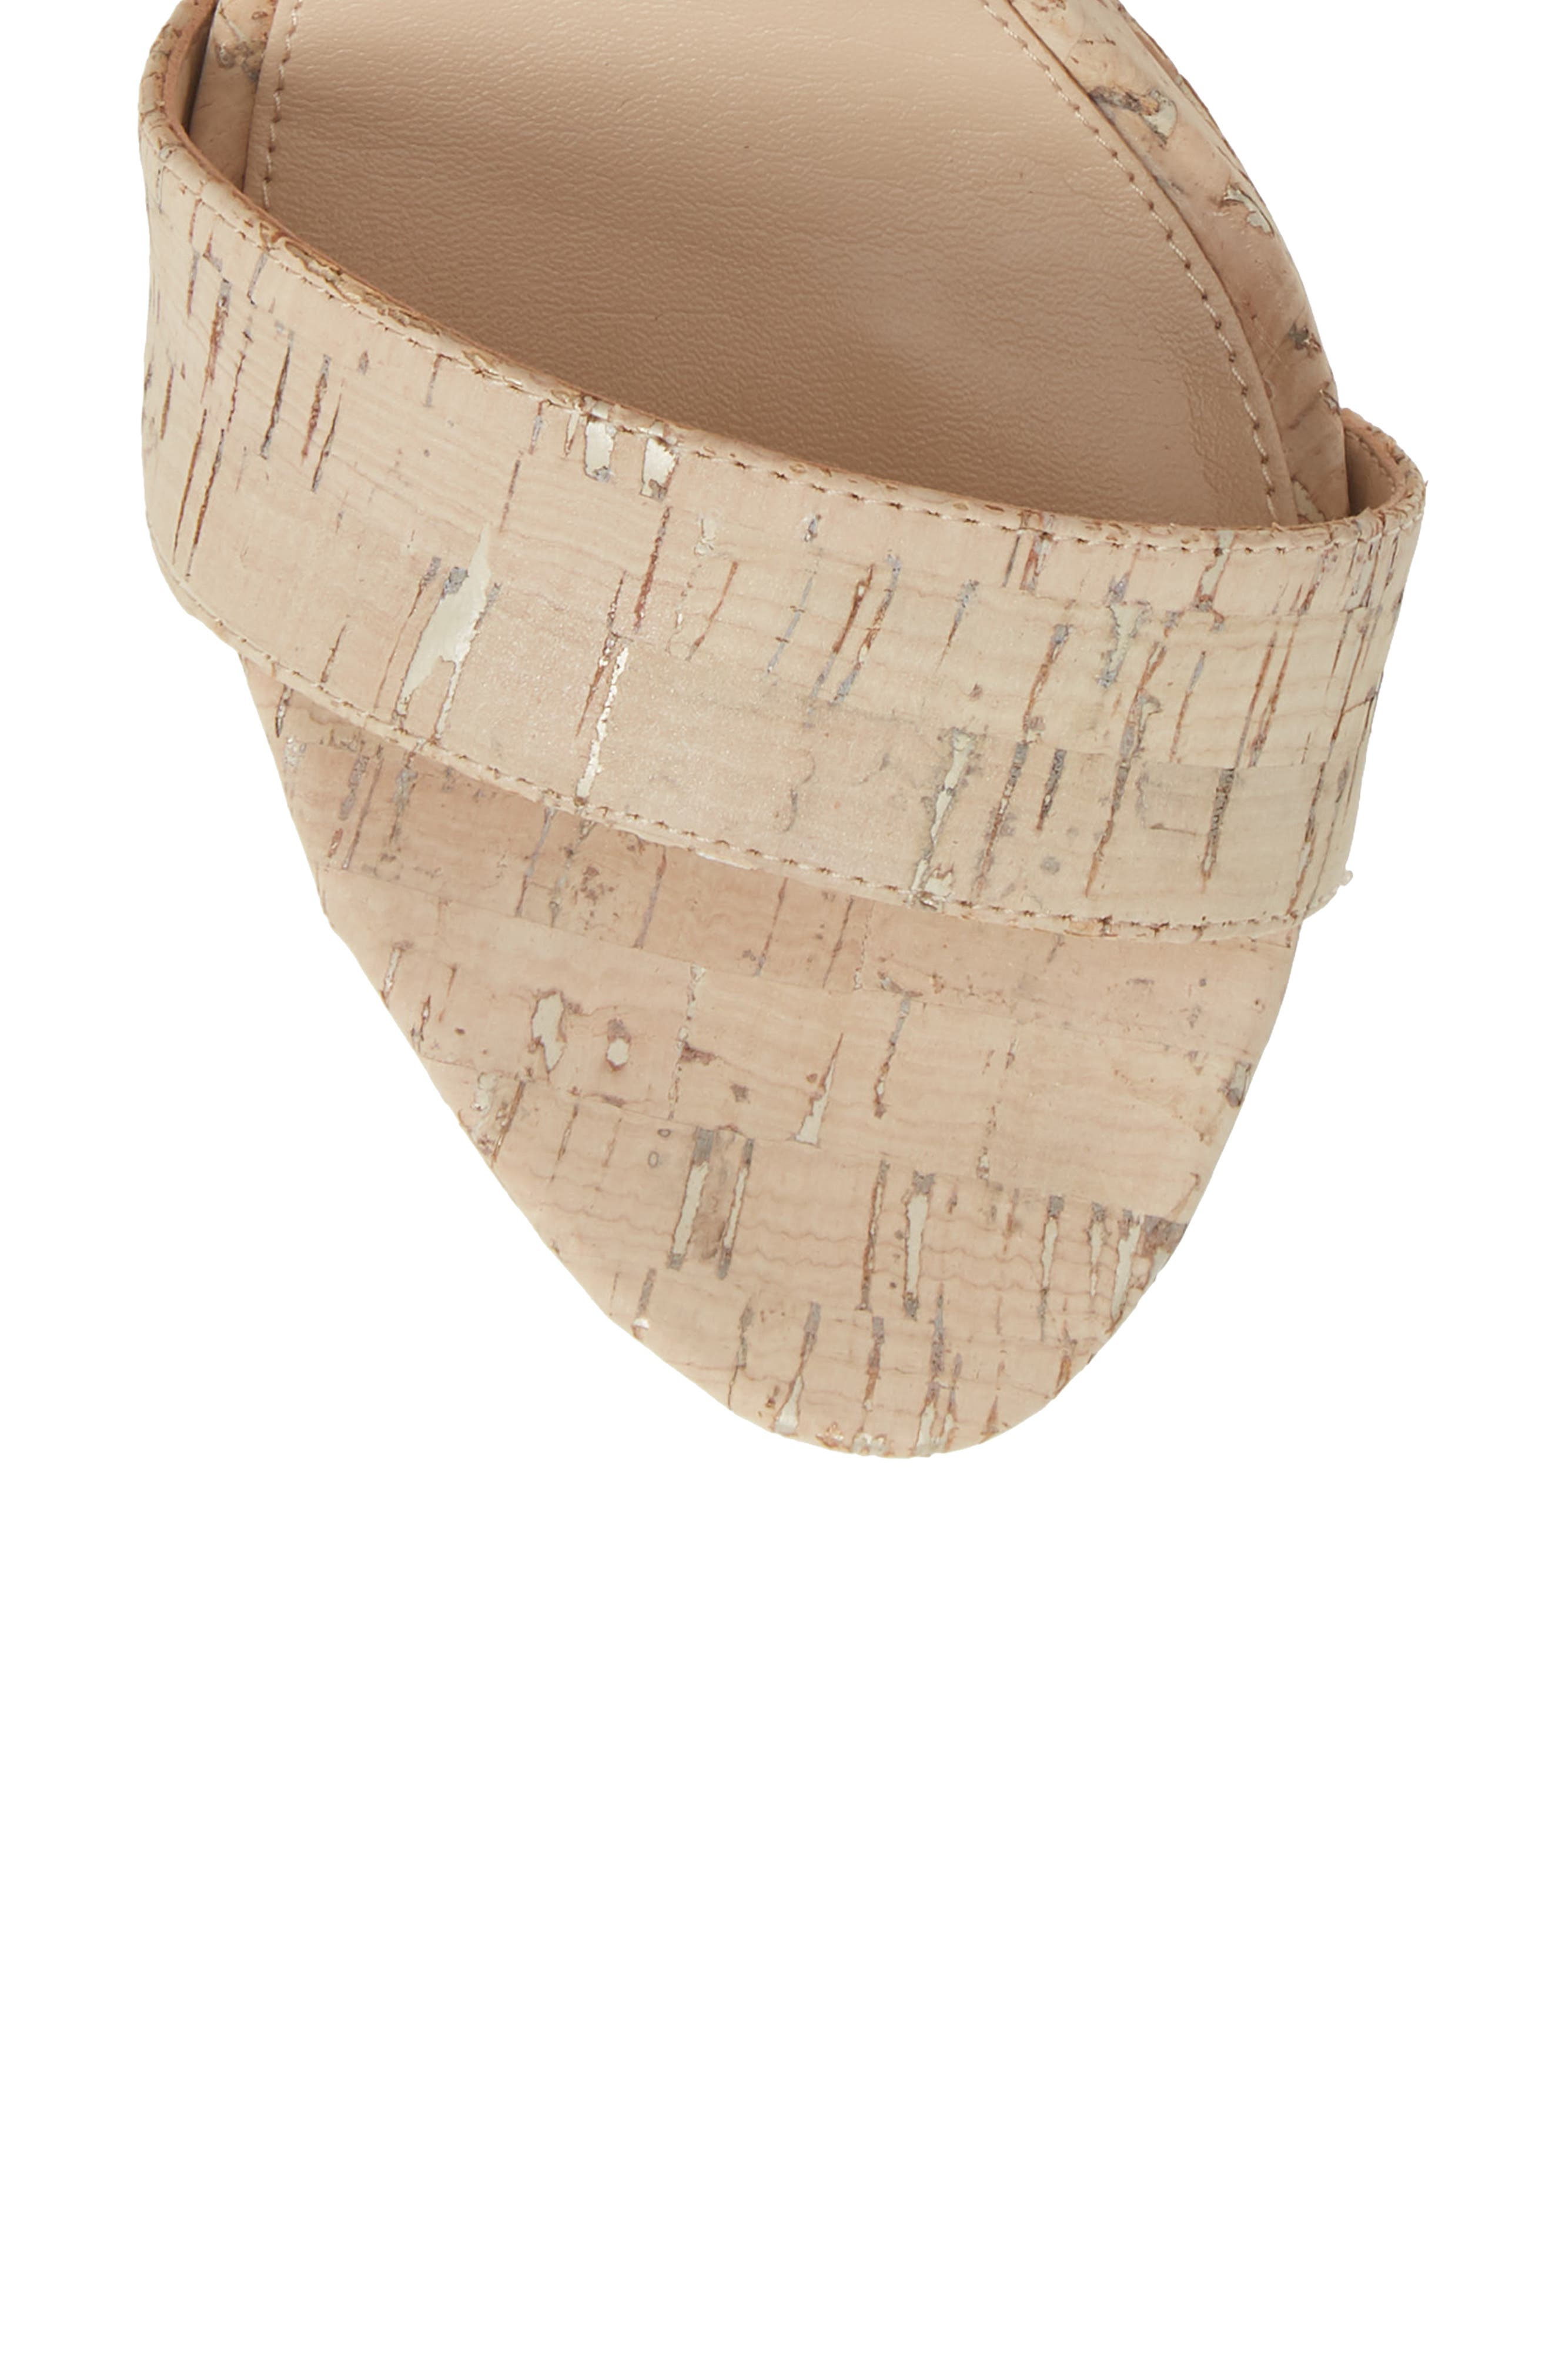 PELLE MODA,                             Palo 2 Platform Sandal,                             Alternate thumbnail 5, color,                             WHITE WASHED CORK